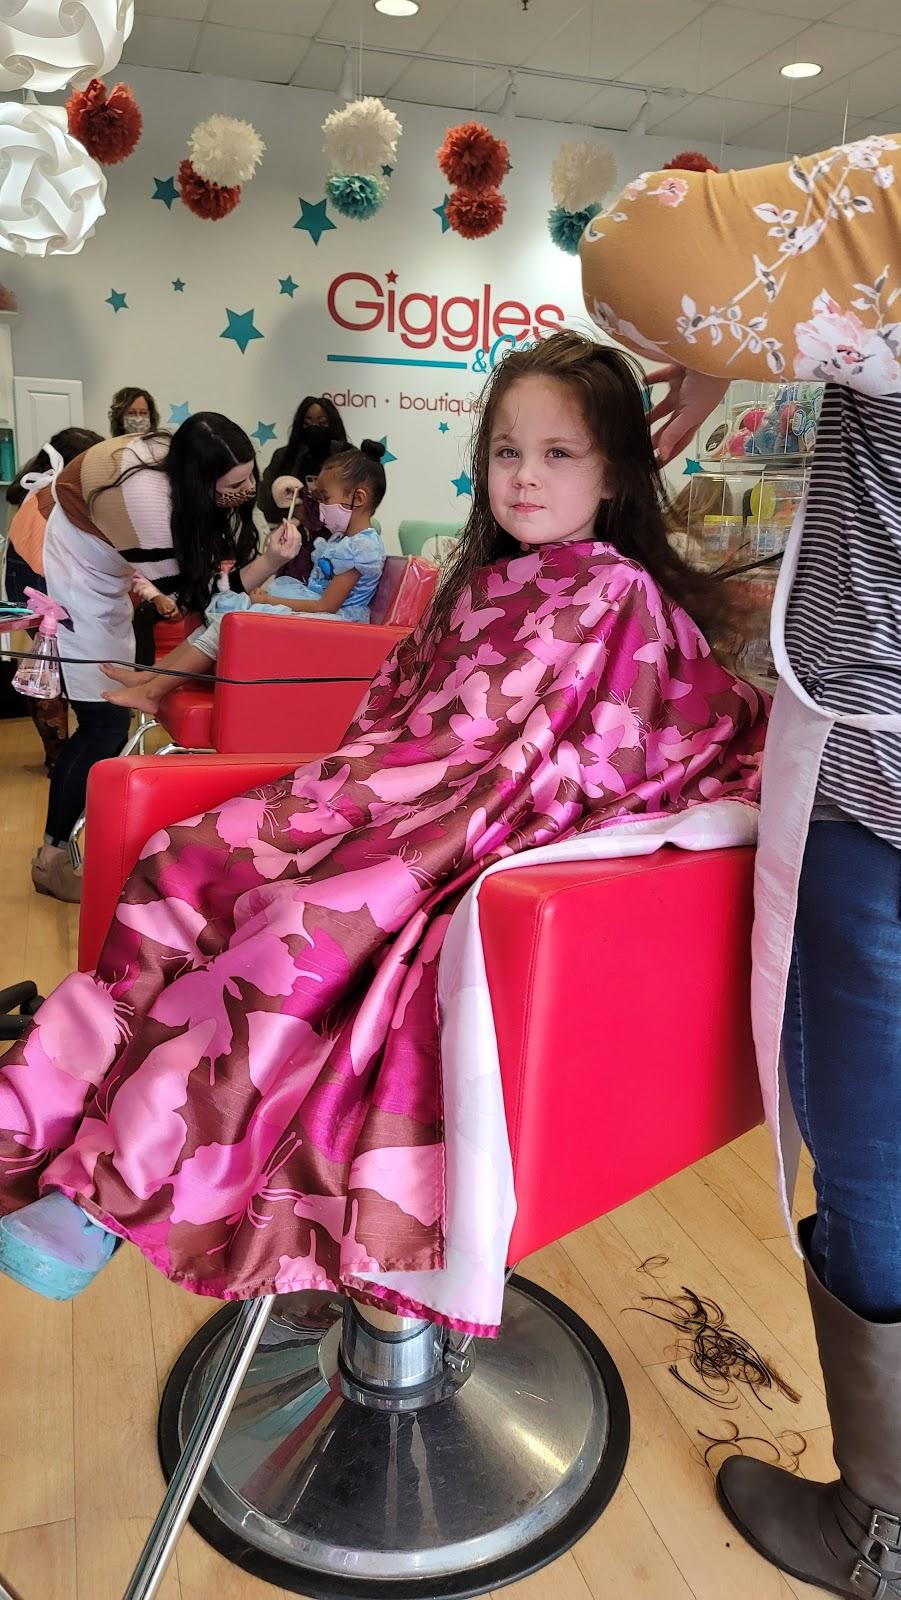 Giggles & Glam Salon - hair care  | Photo 7 of 10 | Address: D, 300 Indian Lake Blvd #200, Hendersonville, TN 37075, USA | Phone: (615) 989-1335